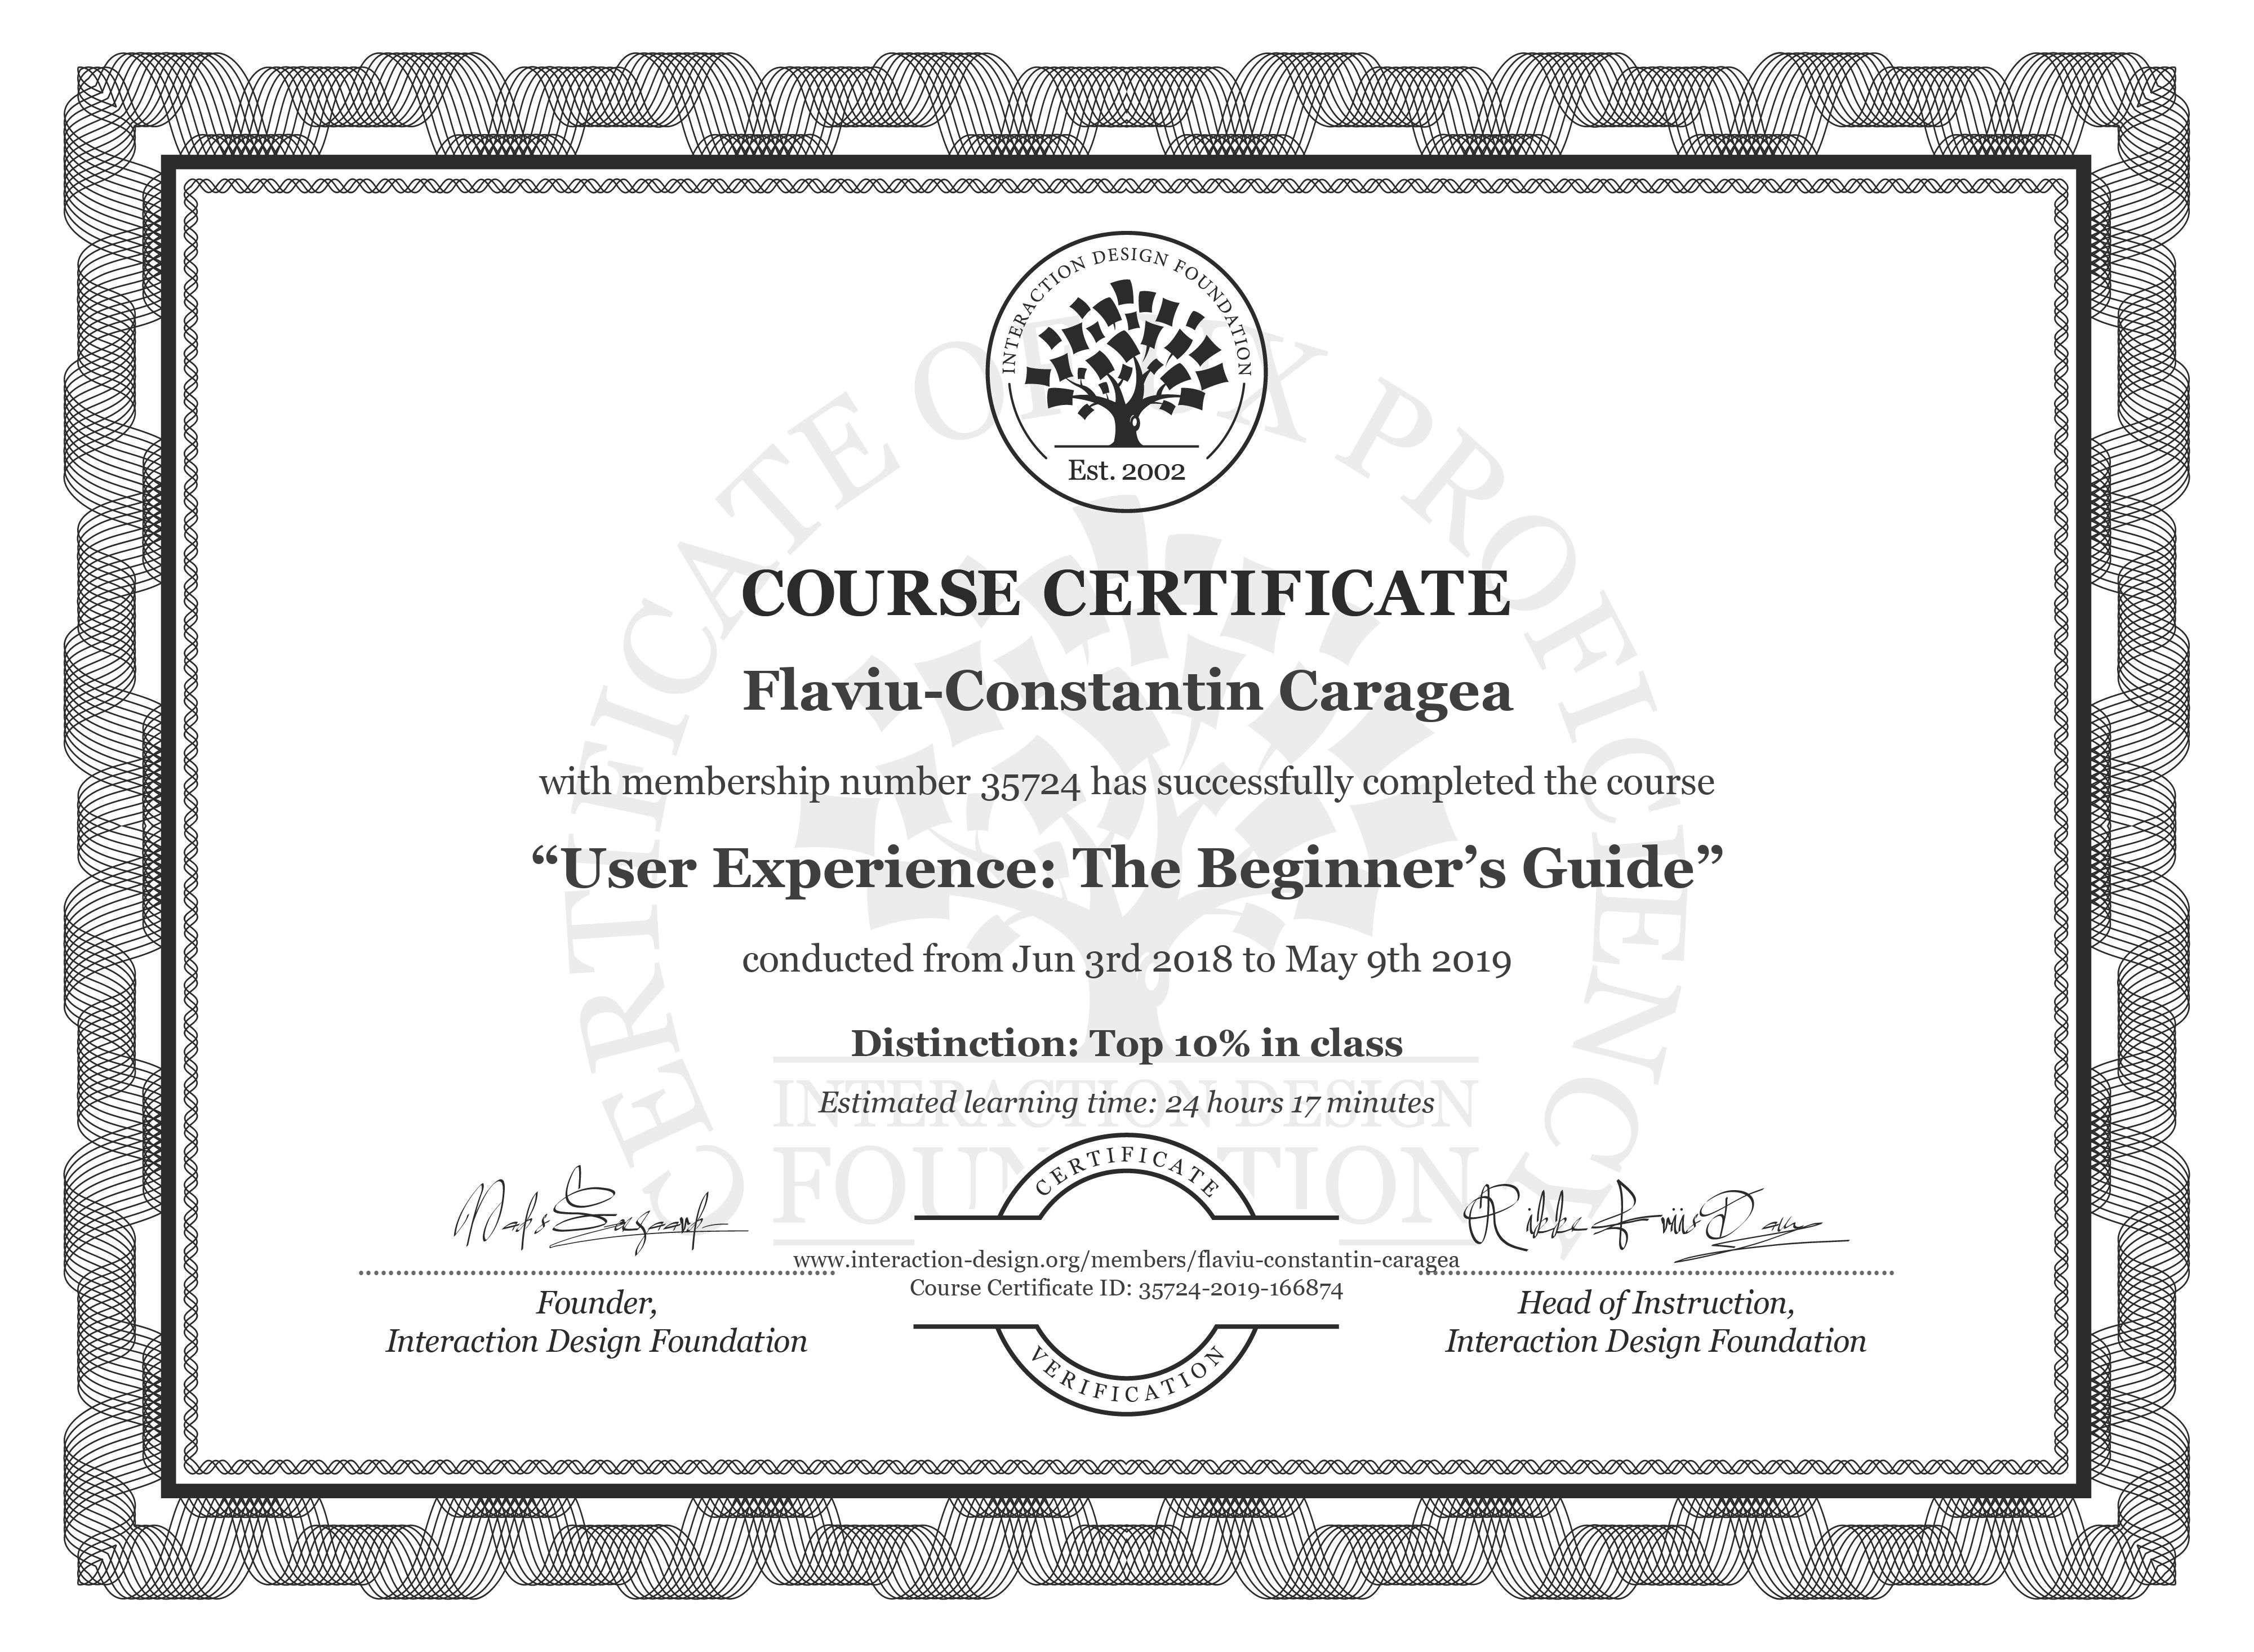 Flaviu-Constantin Caragea: Course Certificate - Become a UX Designer from Scratch